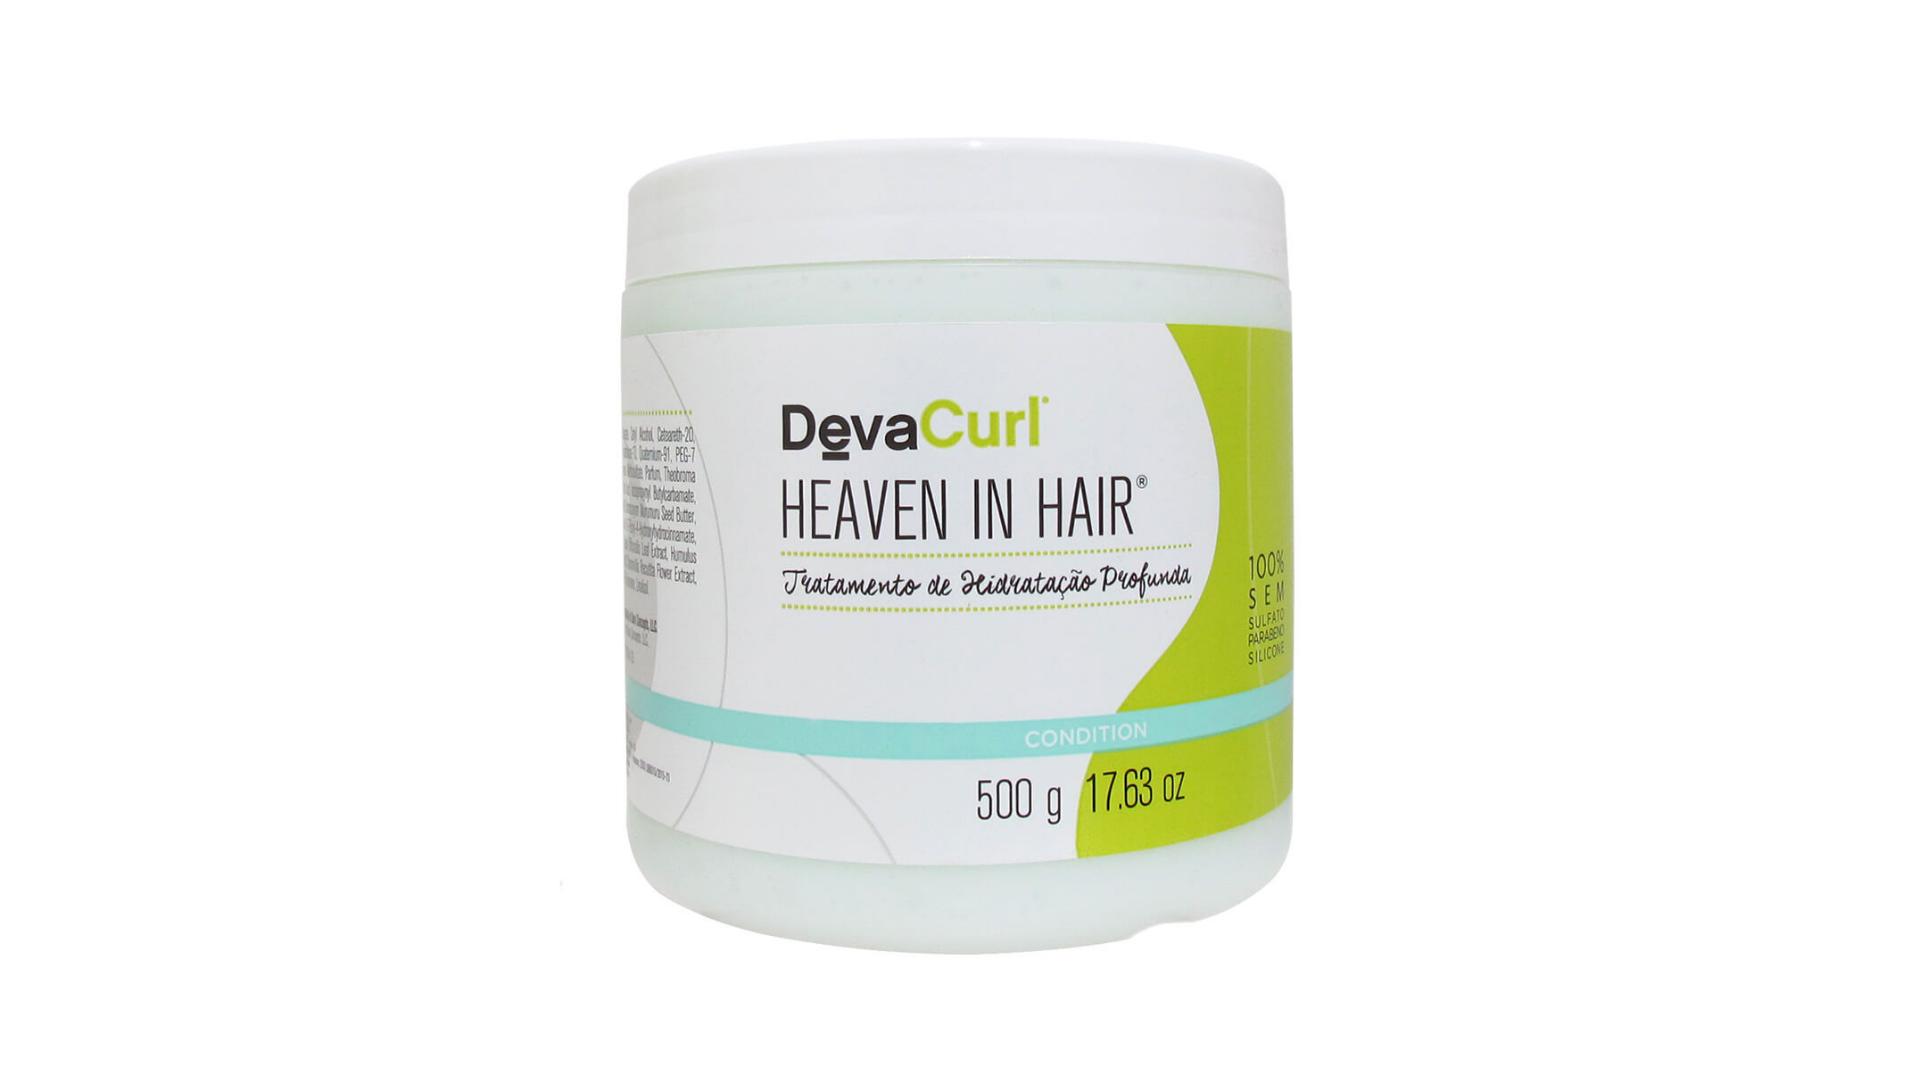 Deva Curl Heaven in Hair (Imagem: Divulgação/Deva Curl)